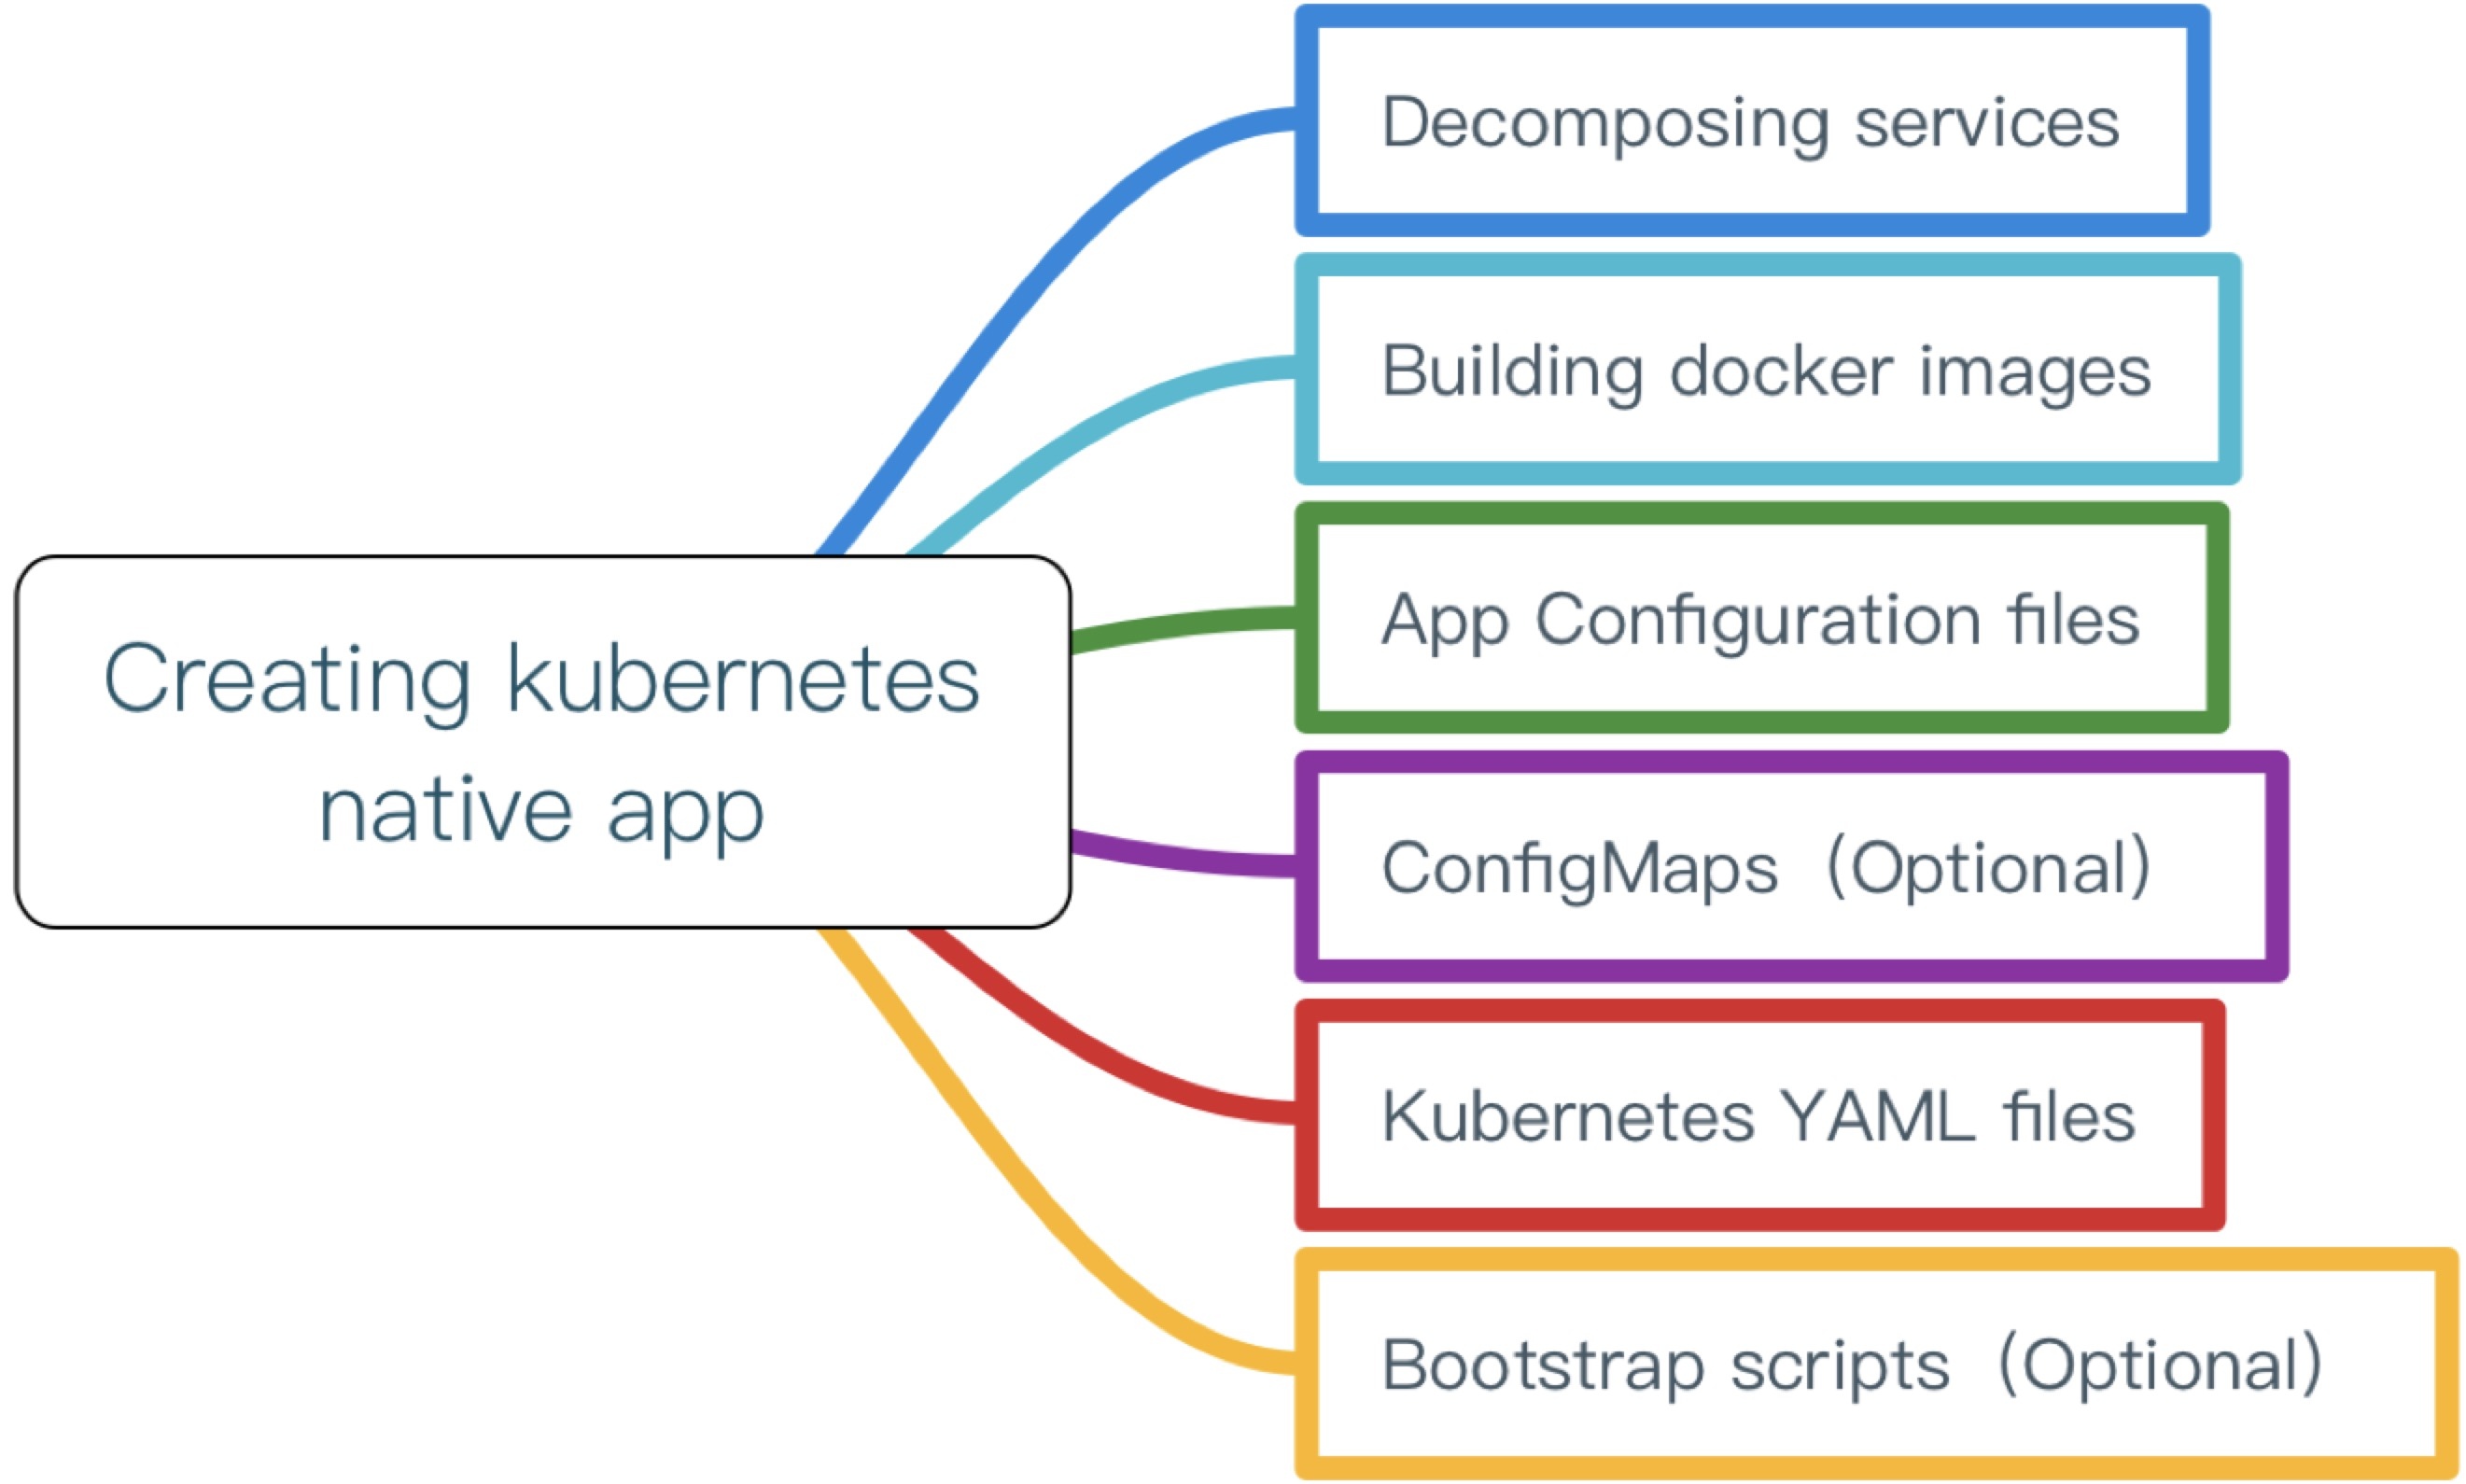 Creating Kubernetes native app